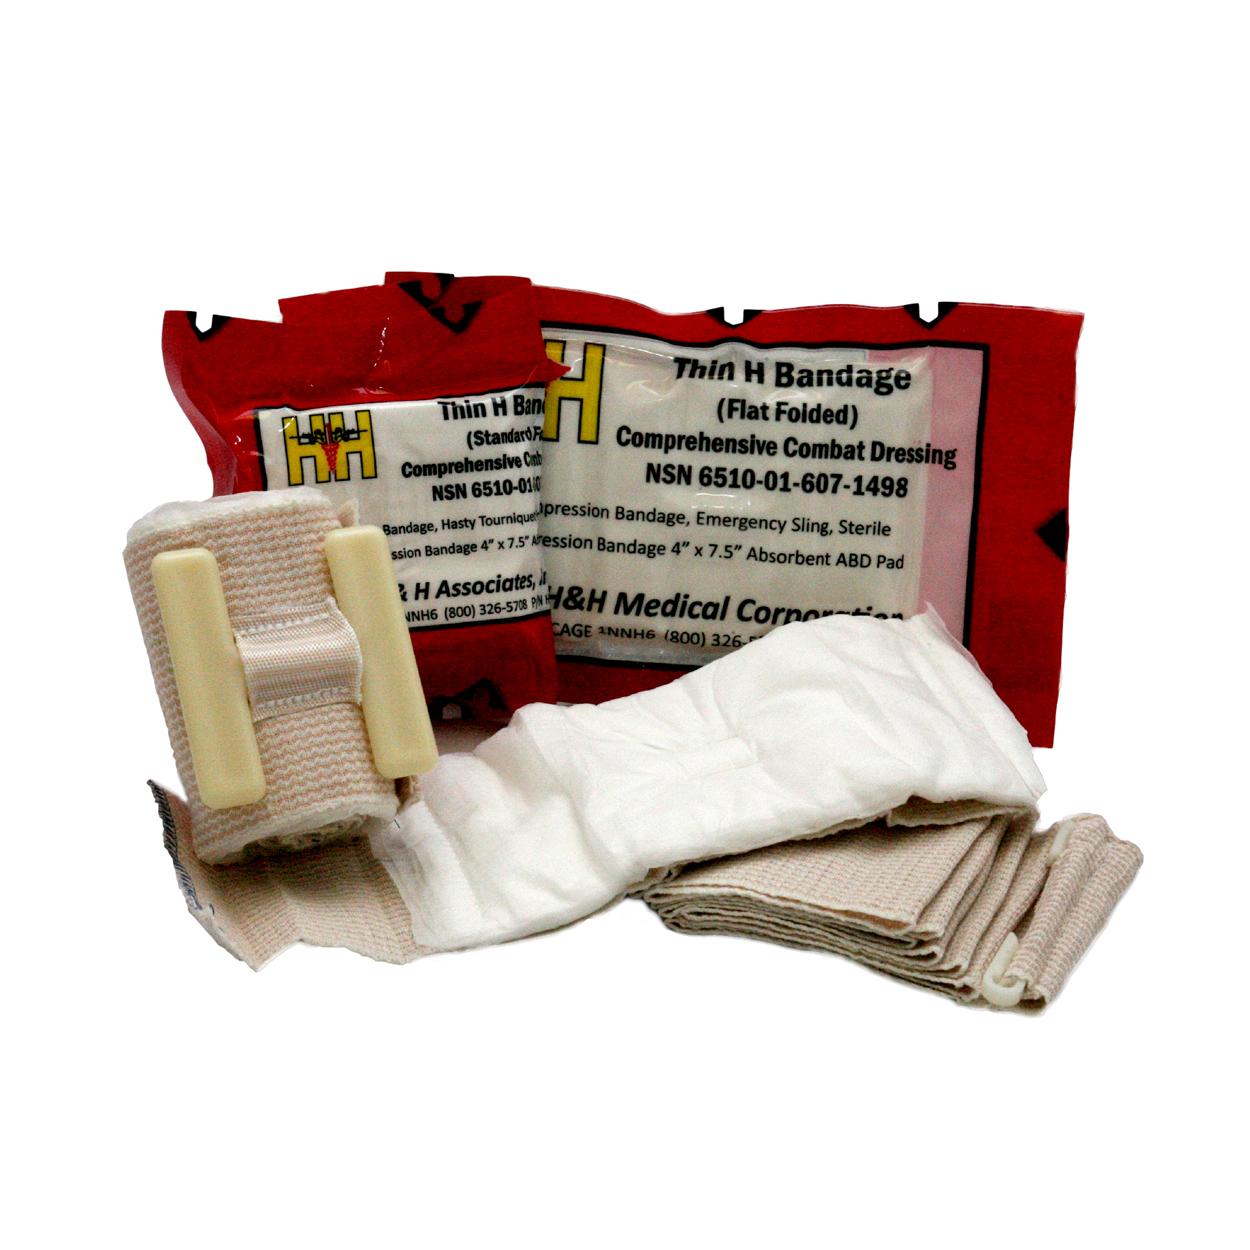 H & H Medical Corporation Thin H-Bandage